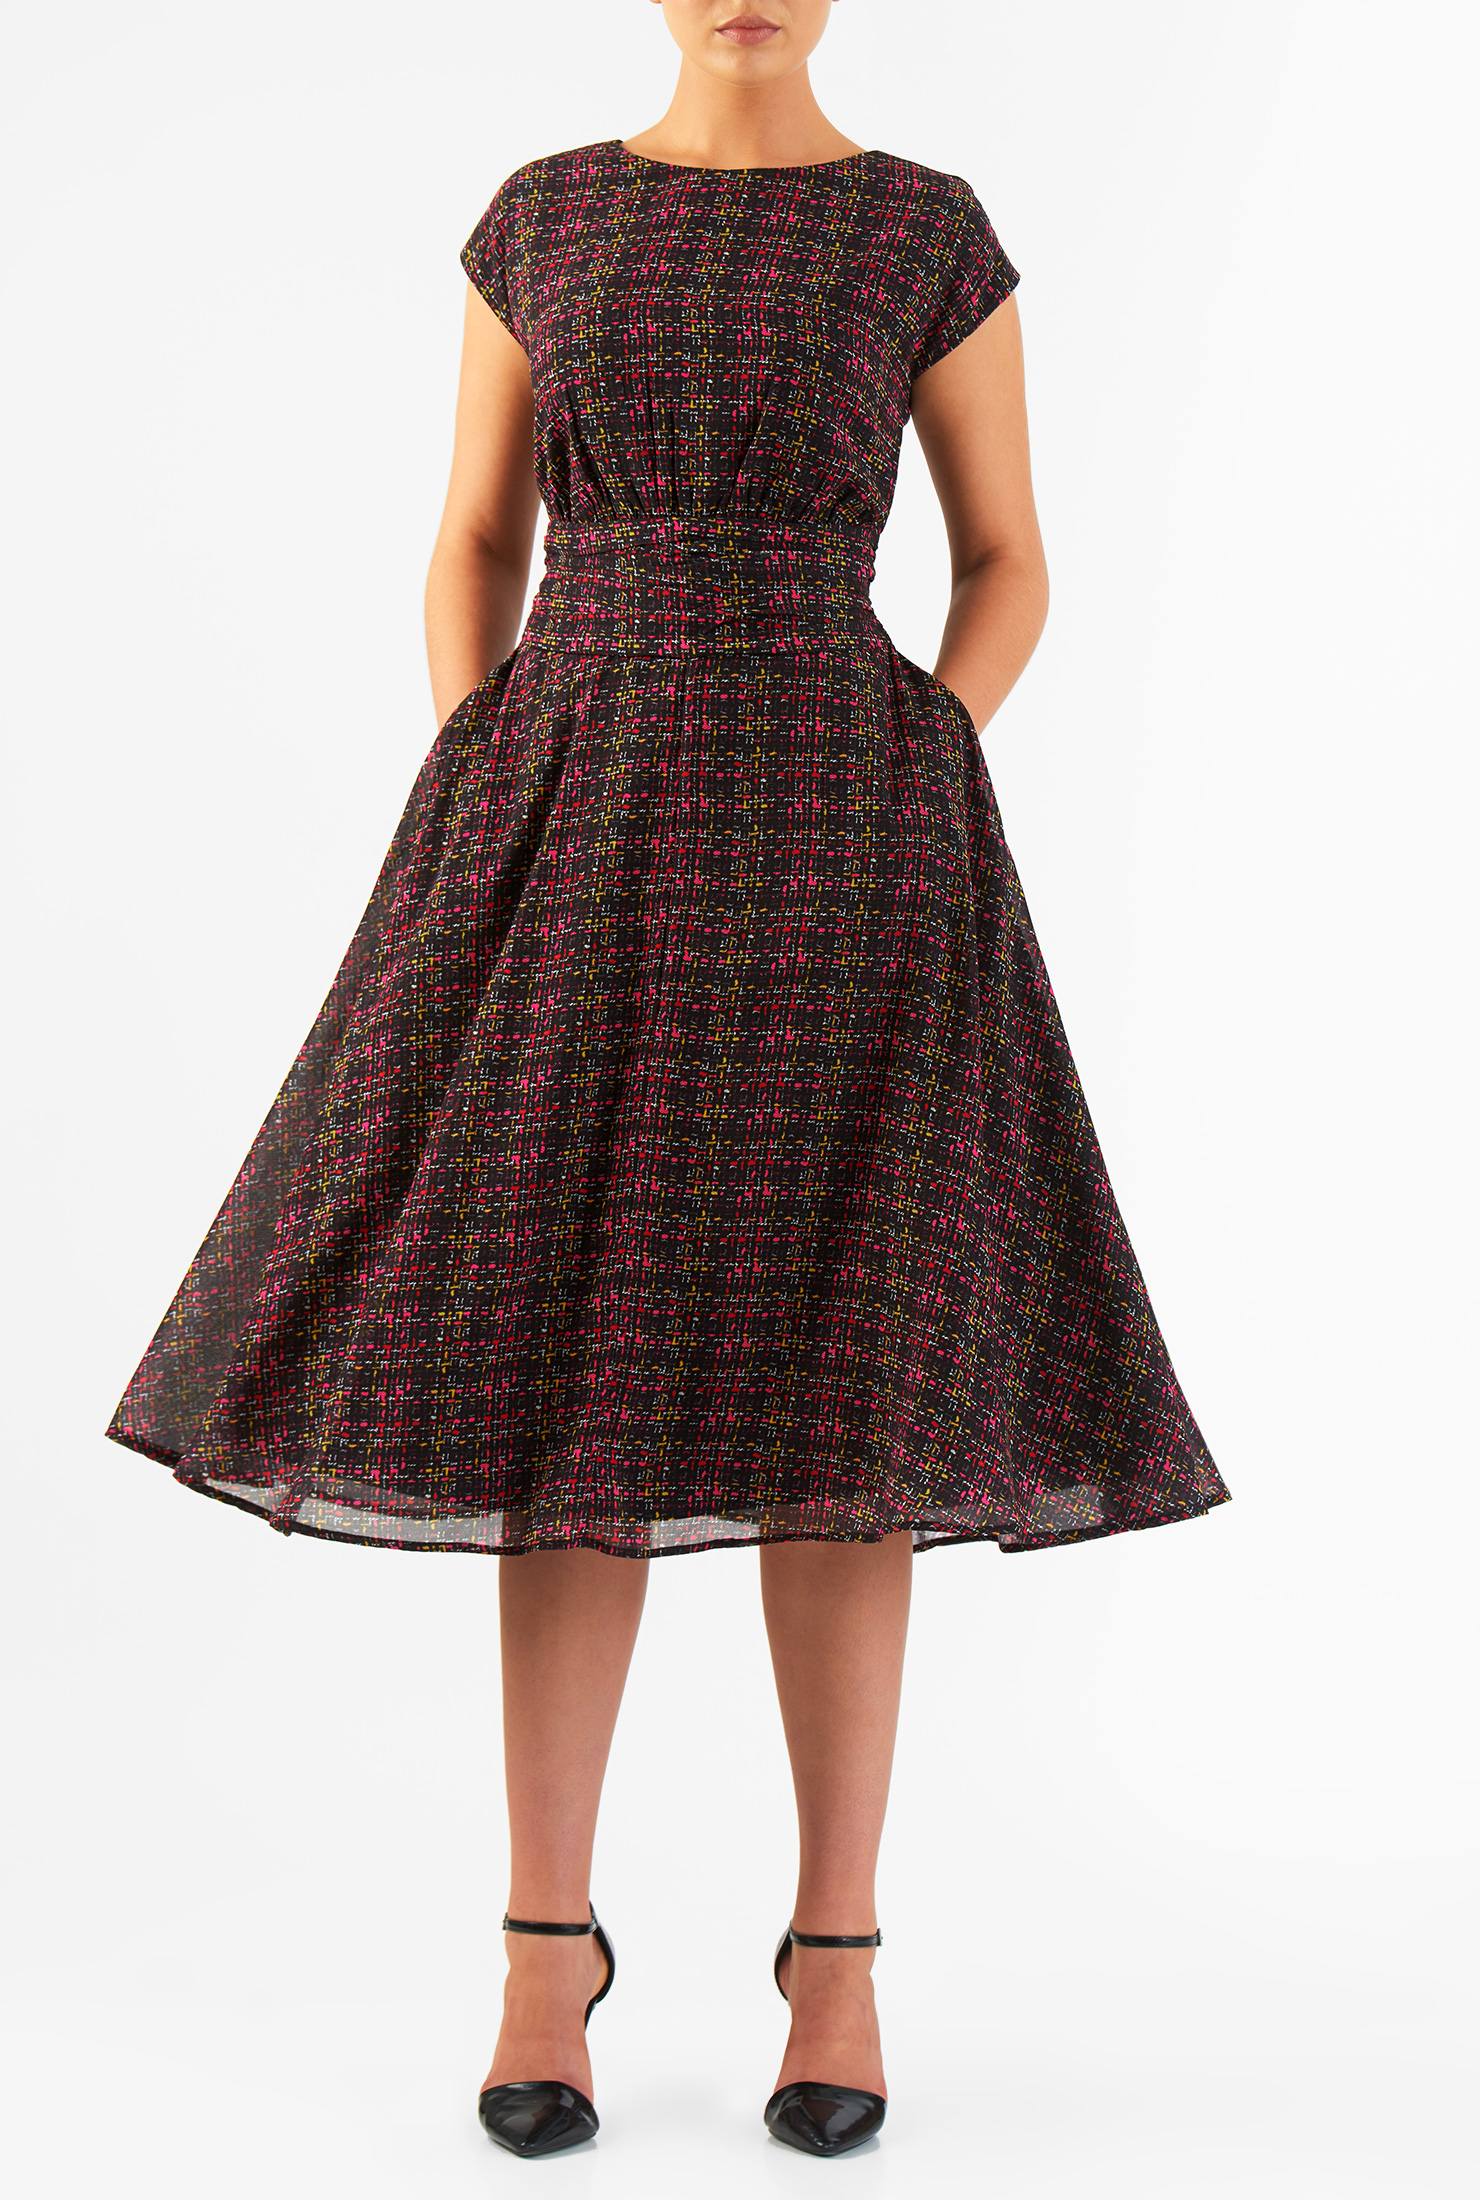 eShakti Women's Tweed print pleated empire georgette dress